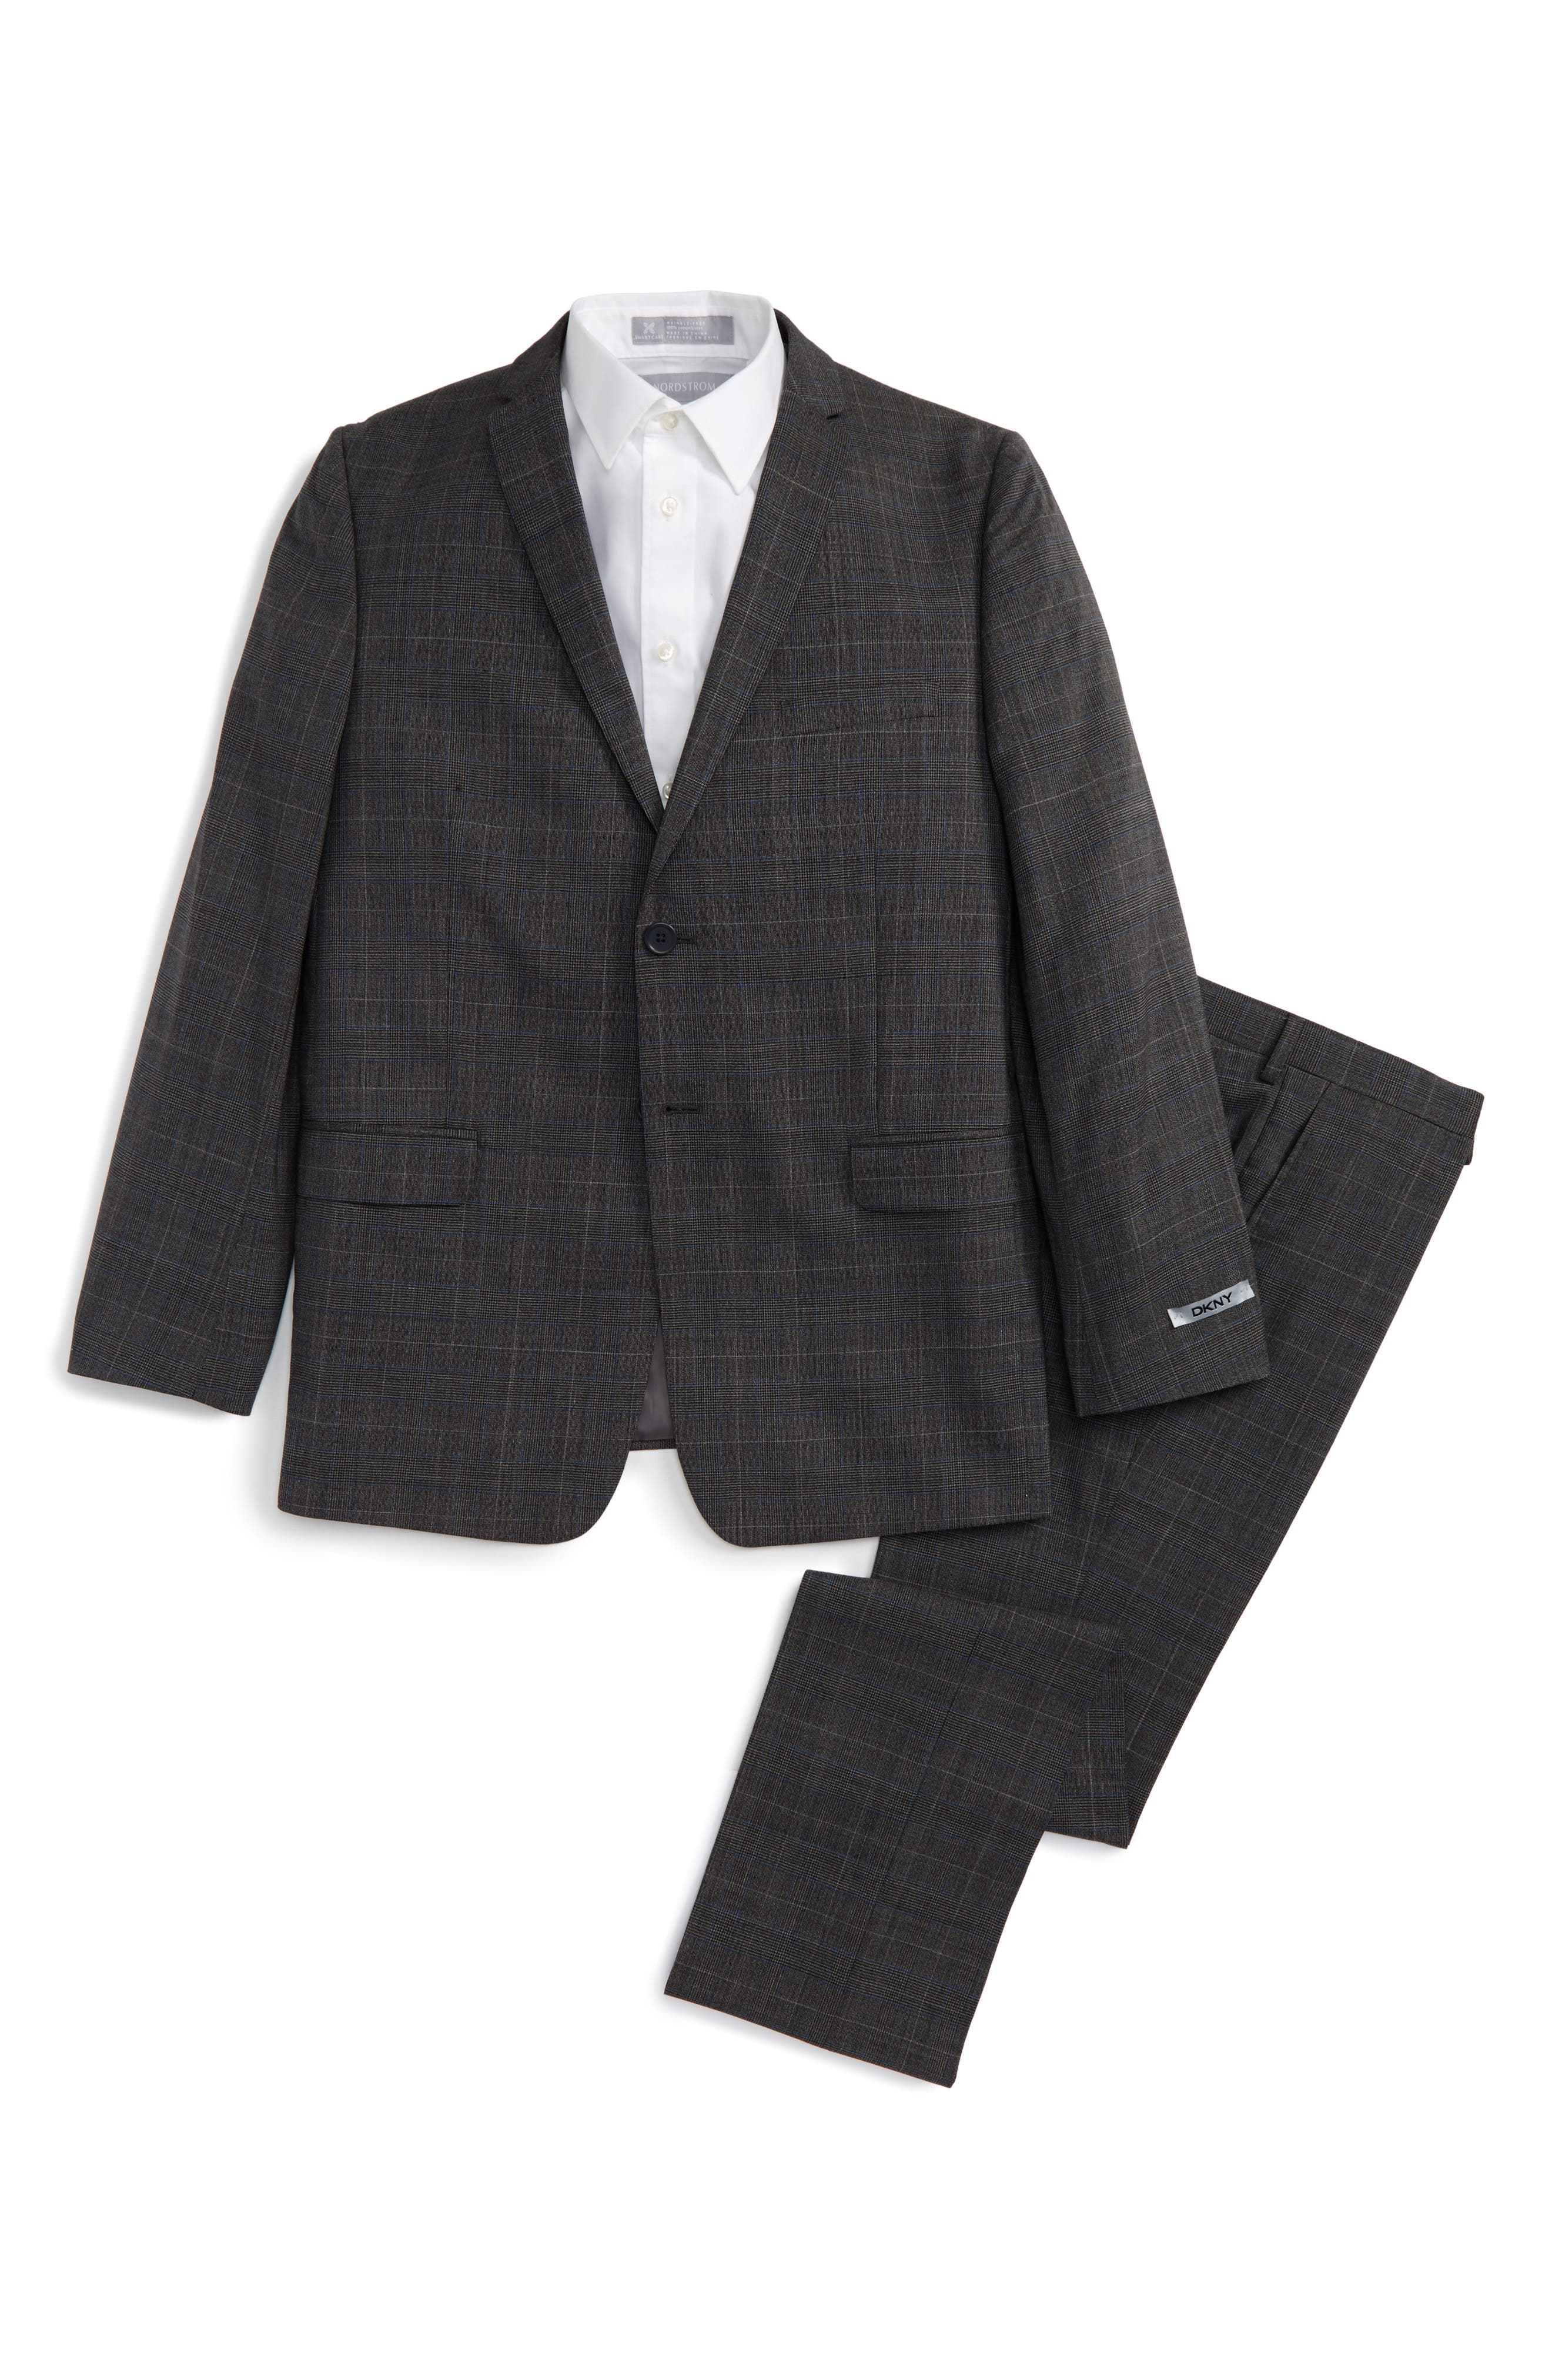 Alternate Image 1 Selected - DKNY Glen Plaid Wool Suit (Big Boys)